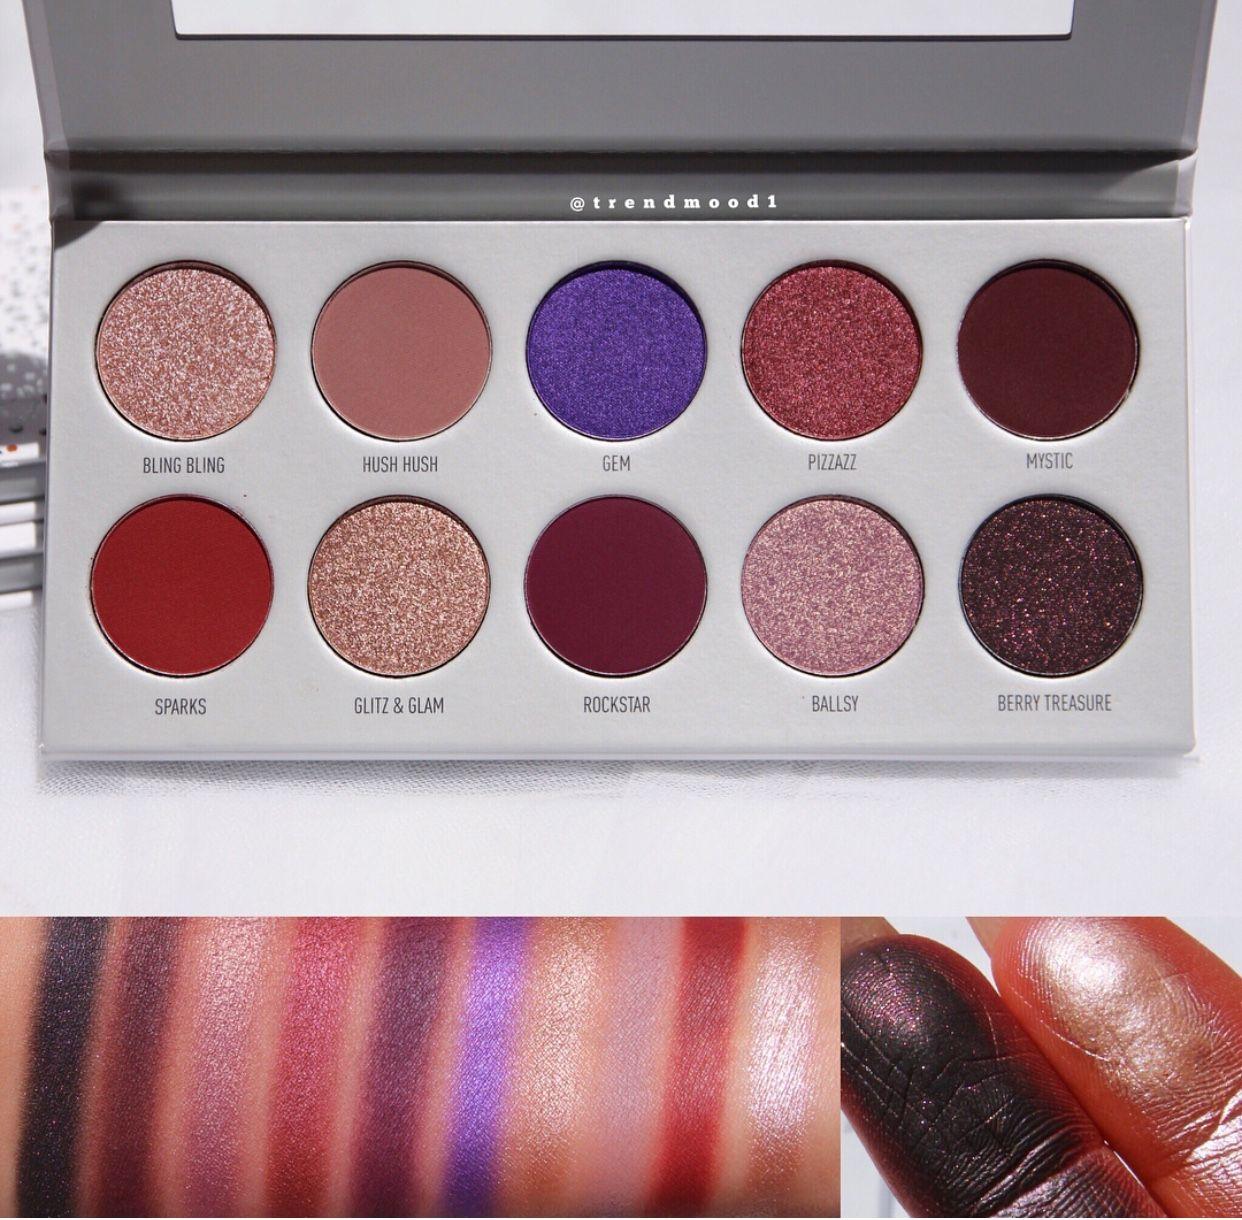 be80acfb50a Jaclyn Hill x Morphe Bling Boss eyeshadow palette | Makeup ...